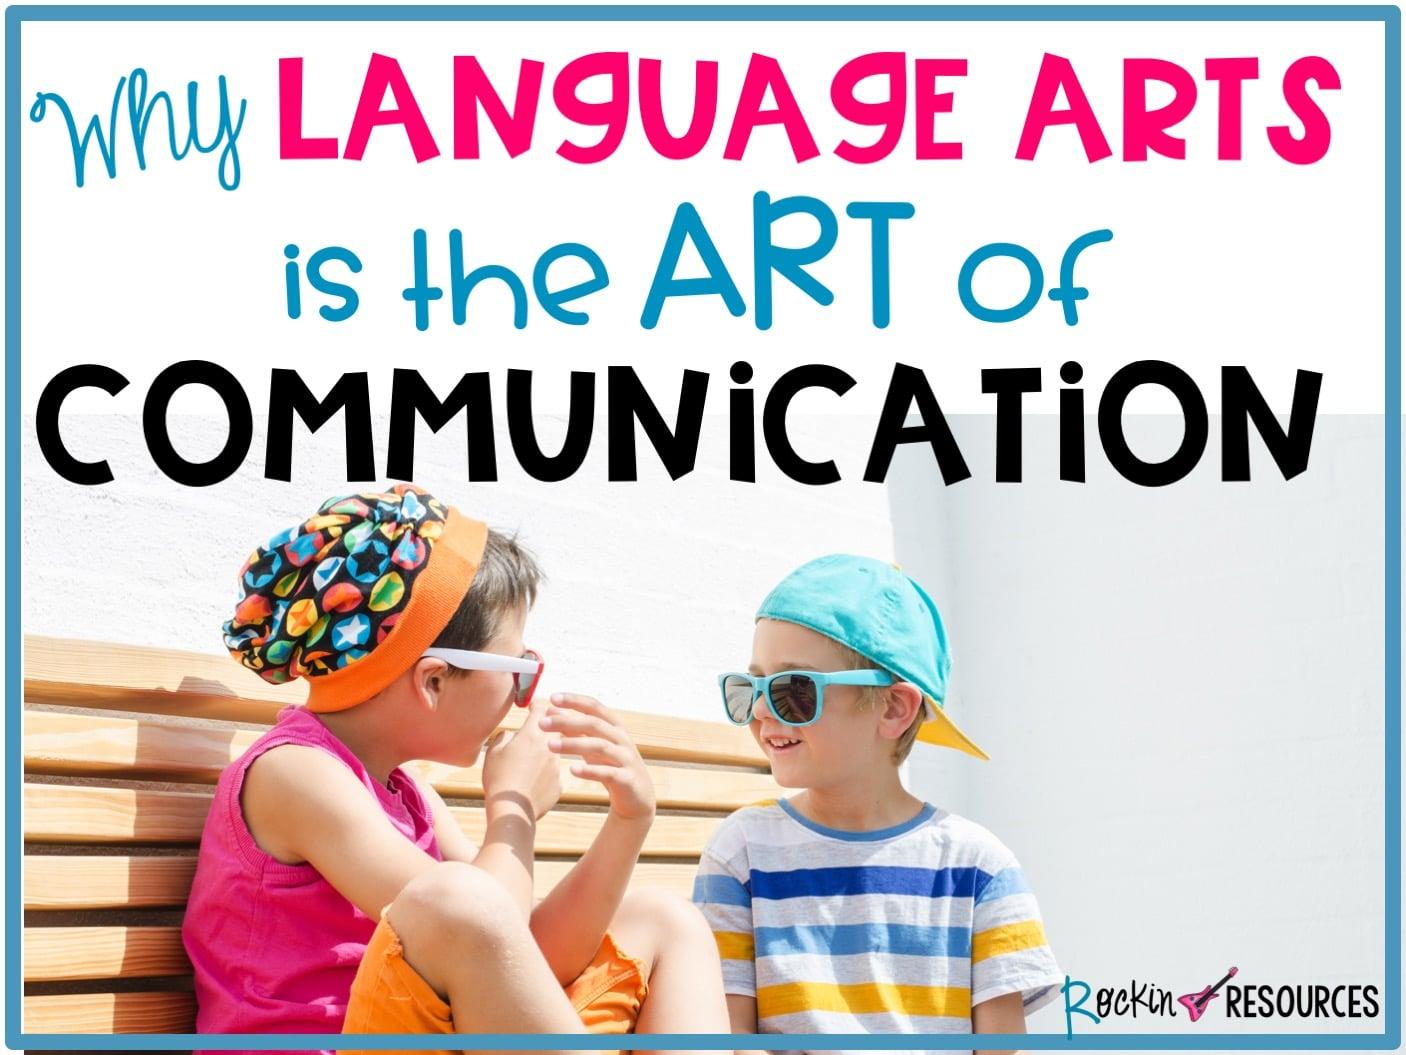 art, language arts, communication, stem, steam